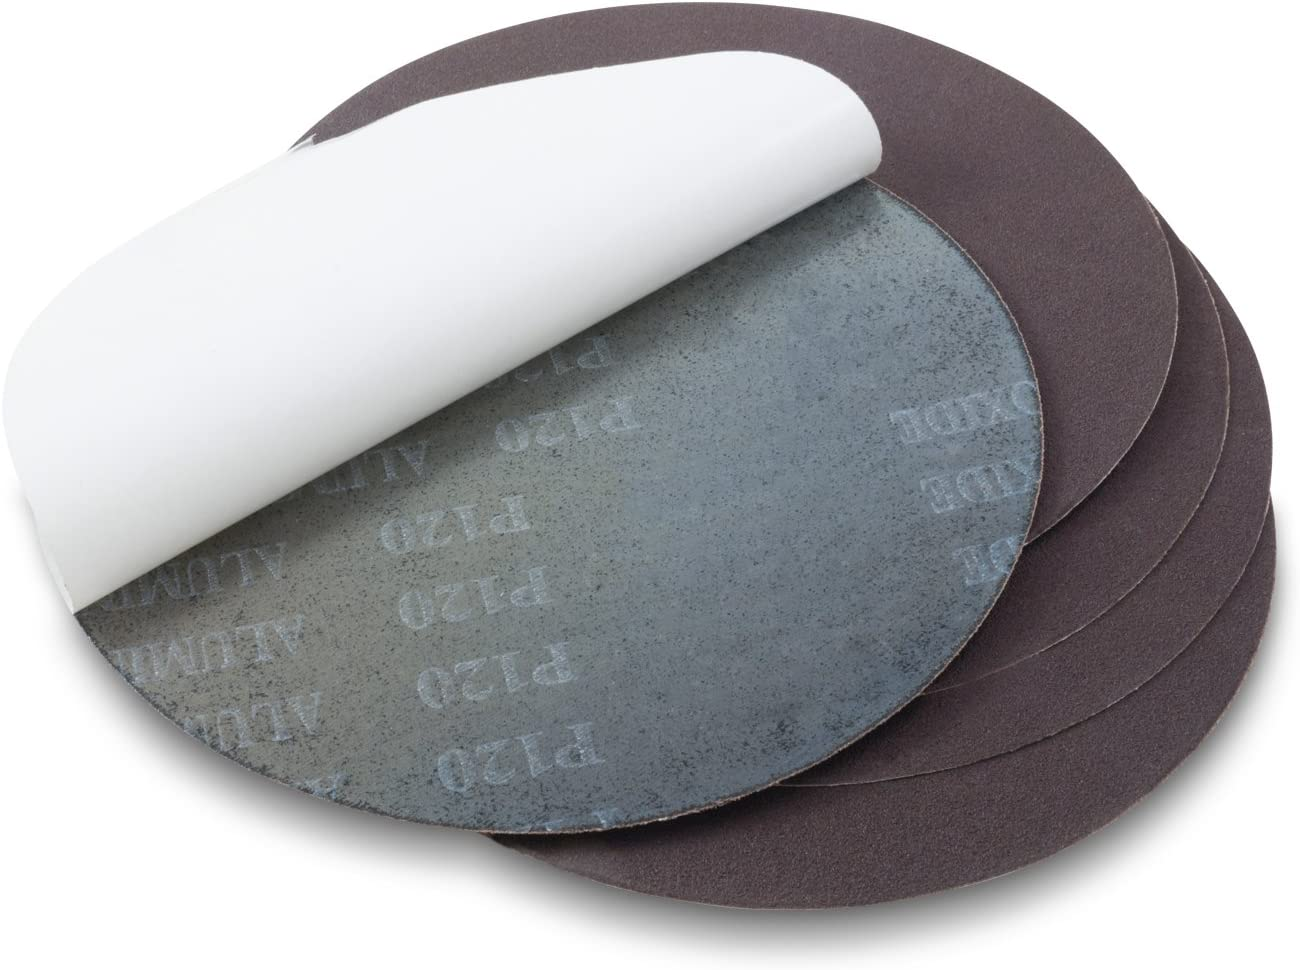 10 Inch 80 Grit Adhesive Back Aluminum Oxide metal Sanding Discs 5 Pack